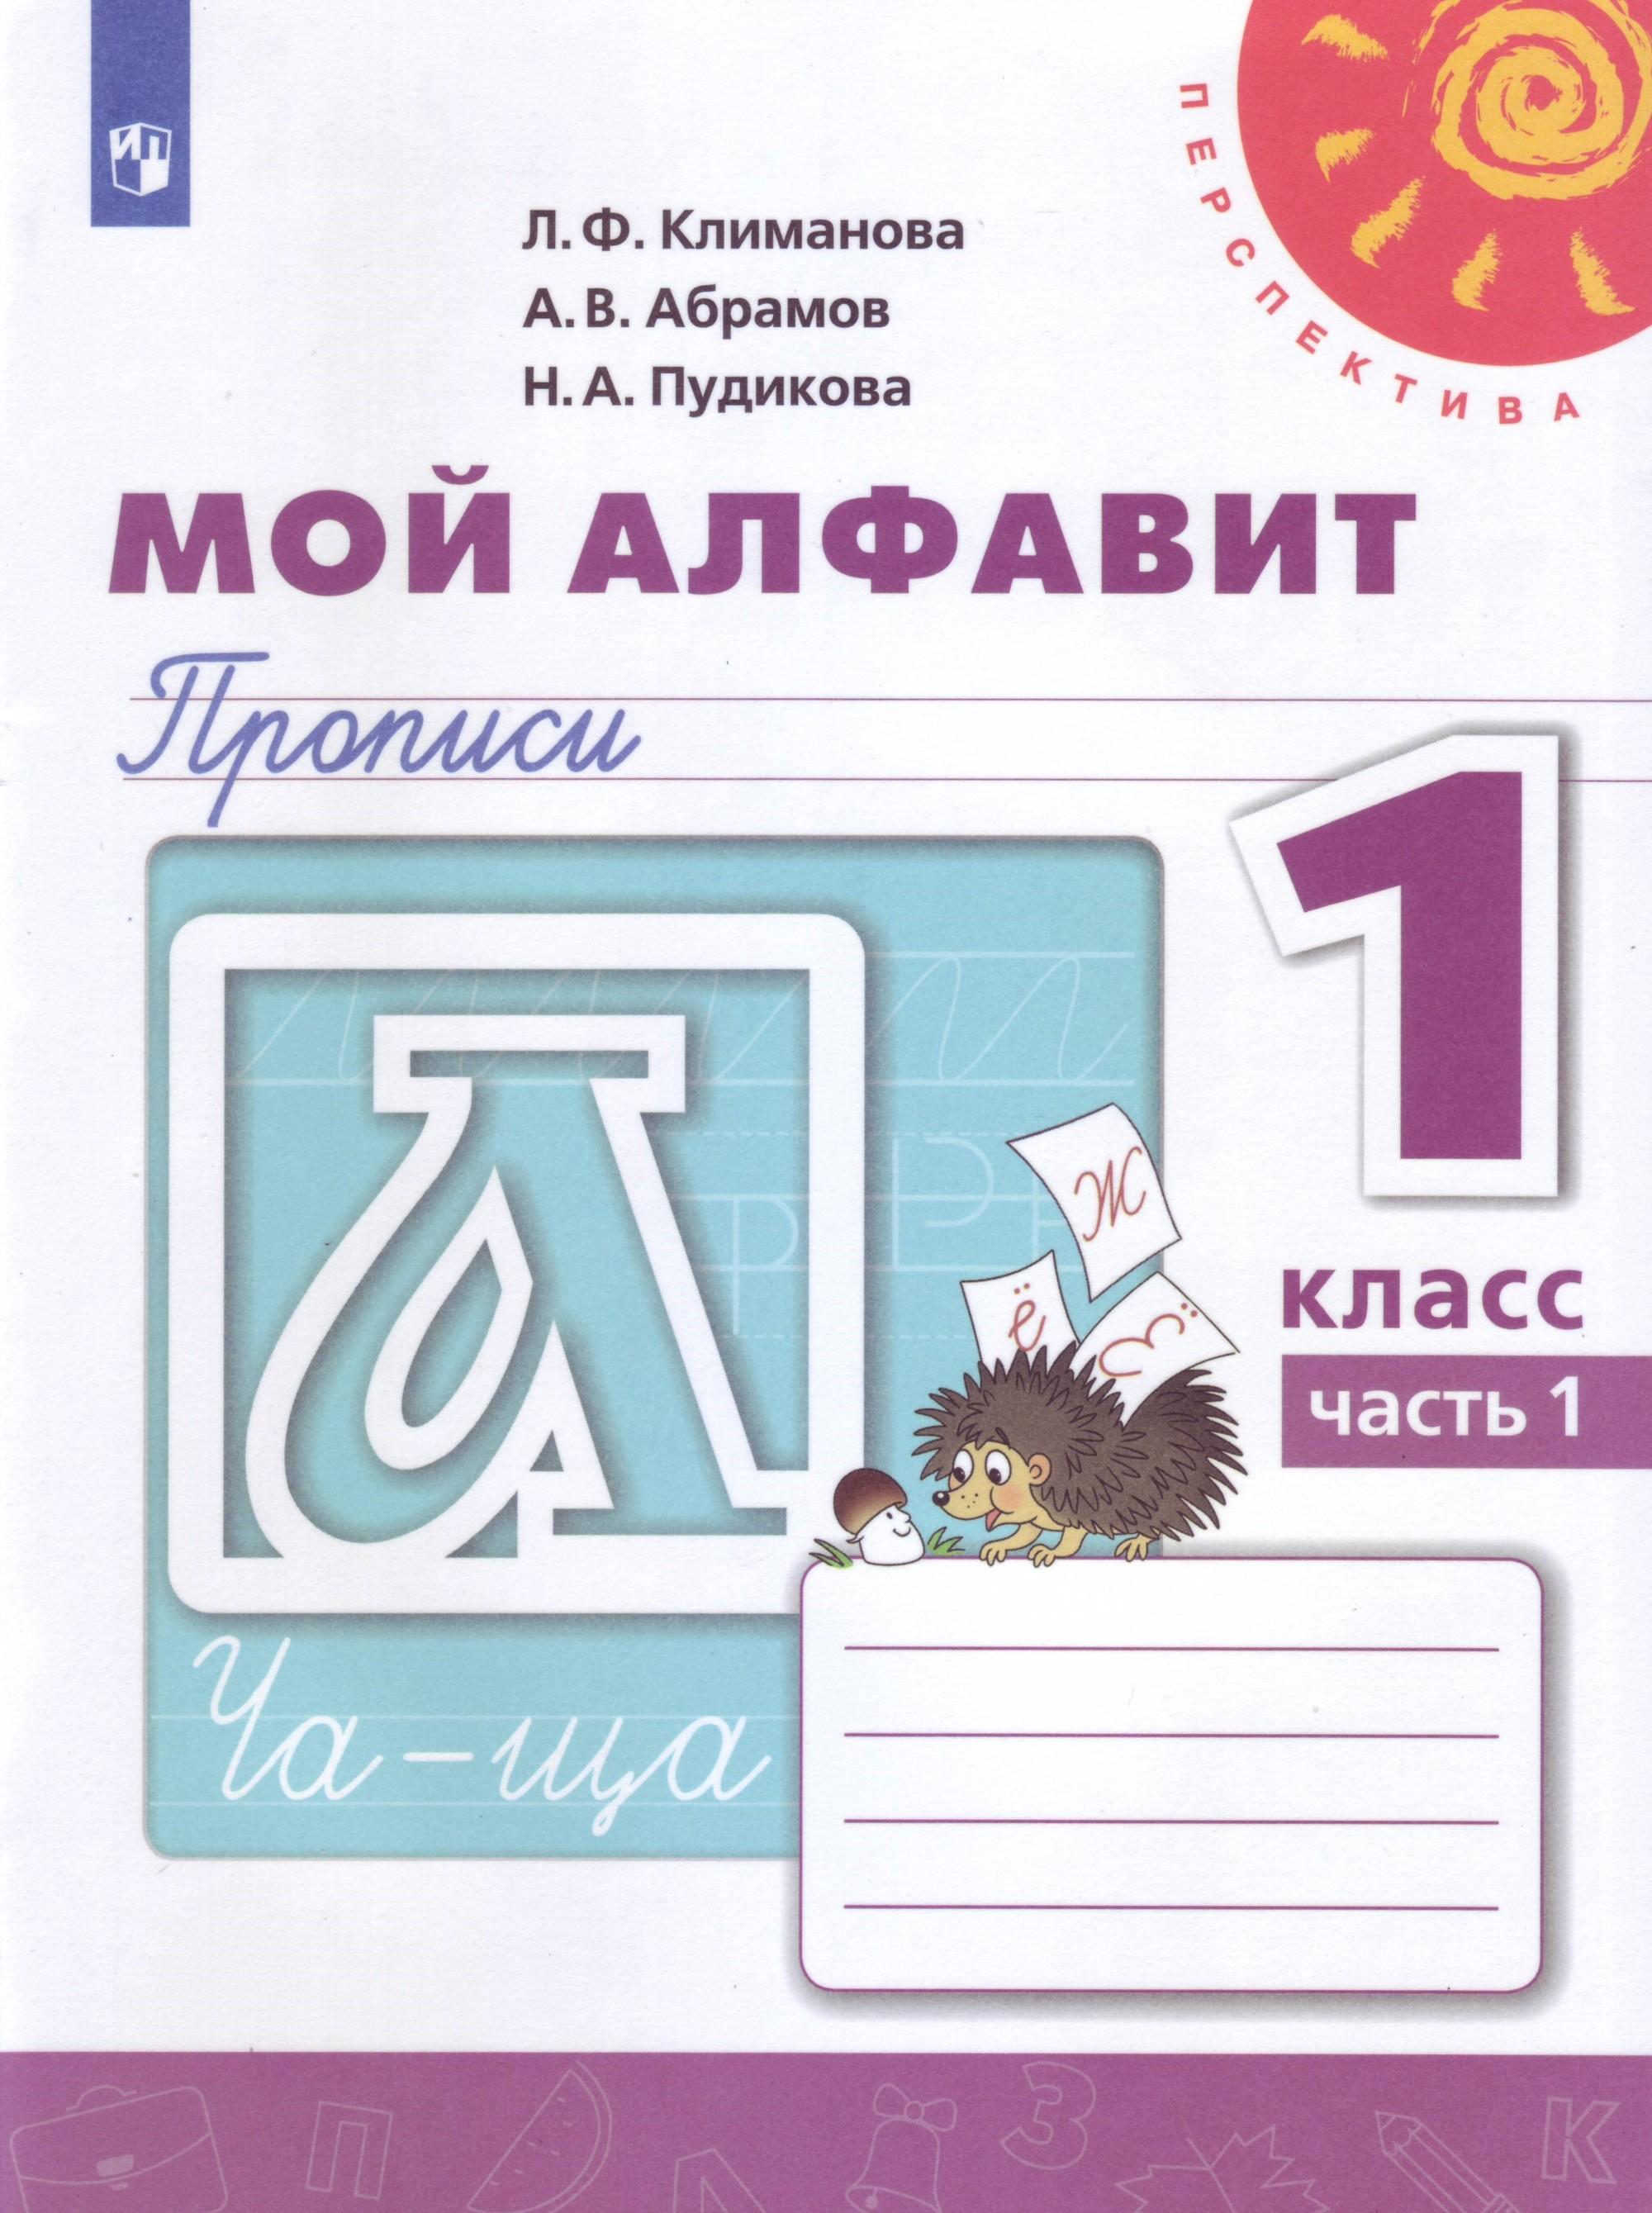 Климанова. Пропись 1 кл. «Мой алфавит» ч.1 (пропись 2) ФП (нов.обл.)